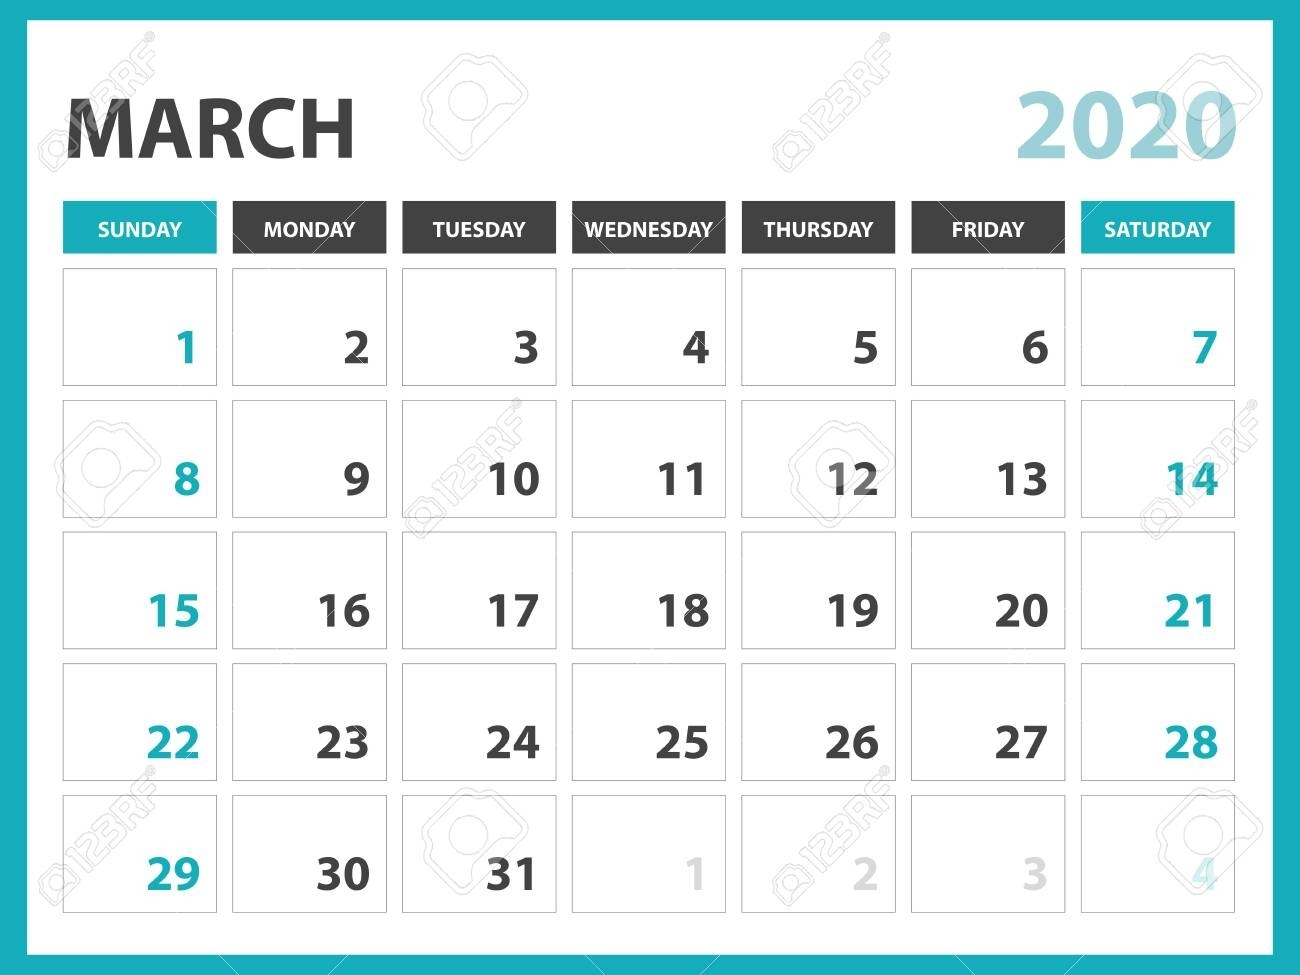 Desk Calendar Layout Size 8 X 6 Inch, March 2020 Calendar Template,.. in 8 X 10 Calendar 2020